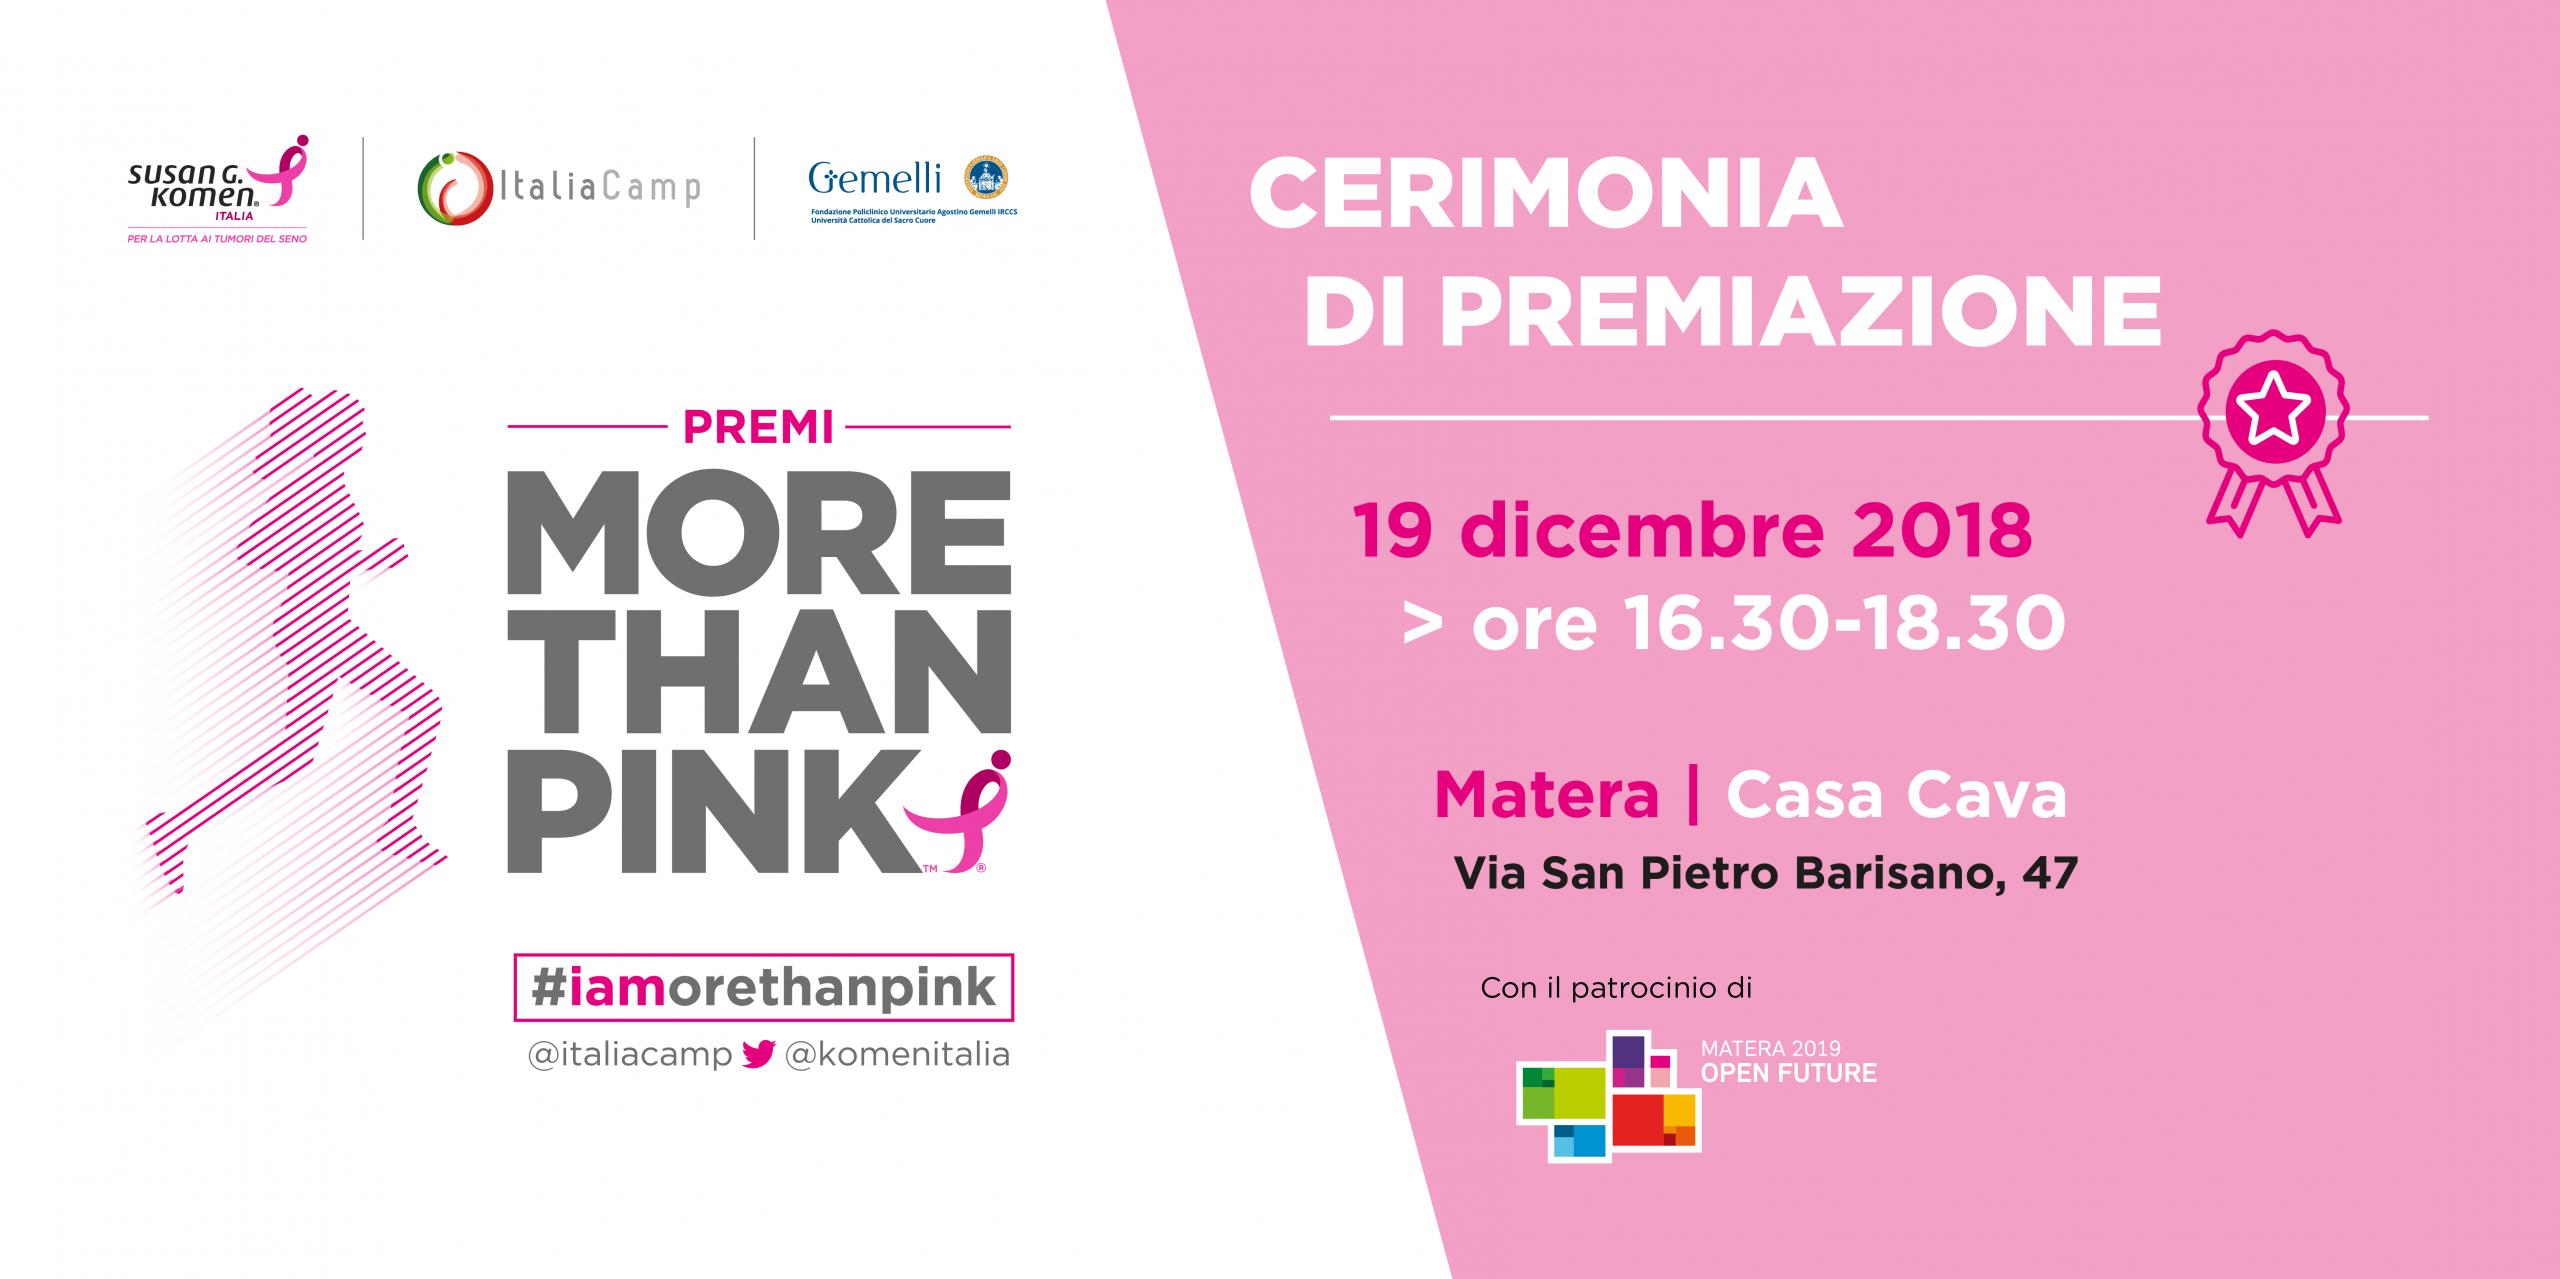 More Than Pink 2018 premiazione